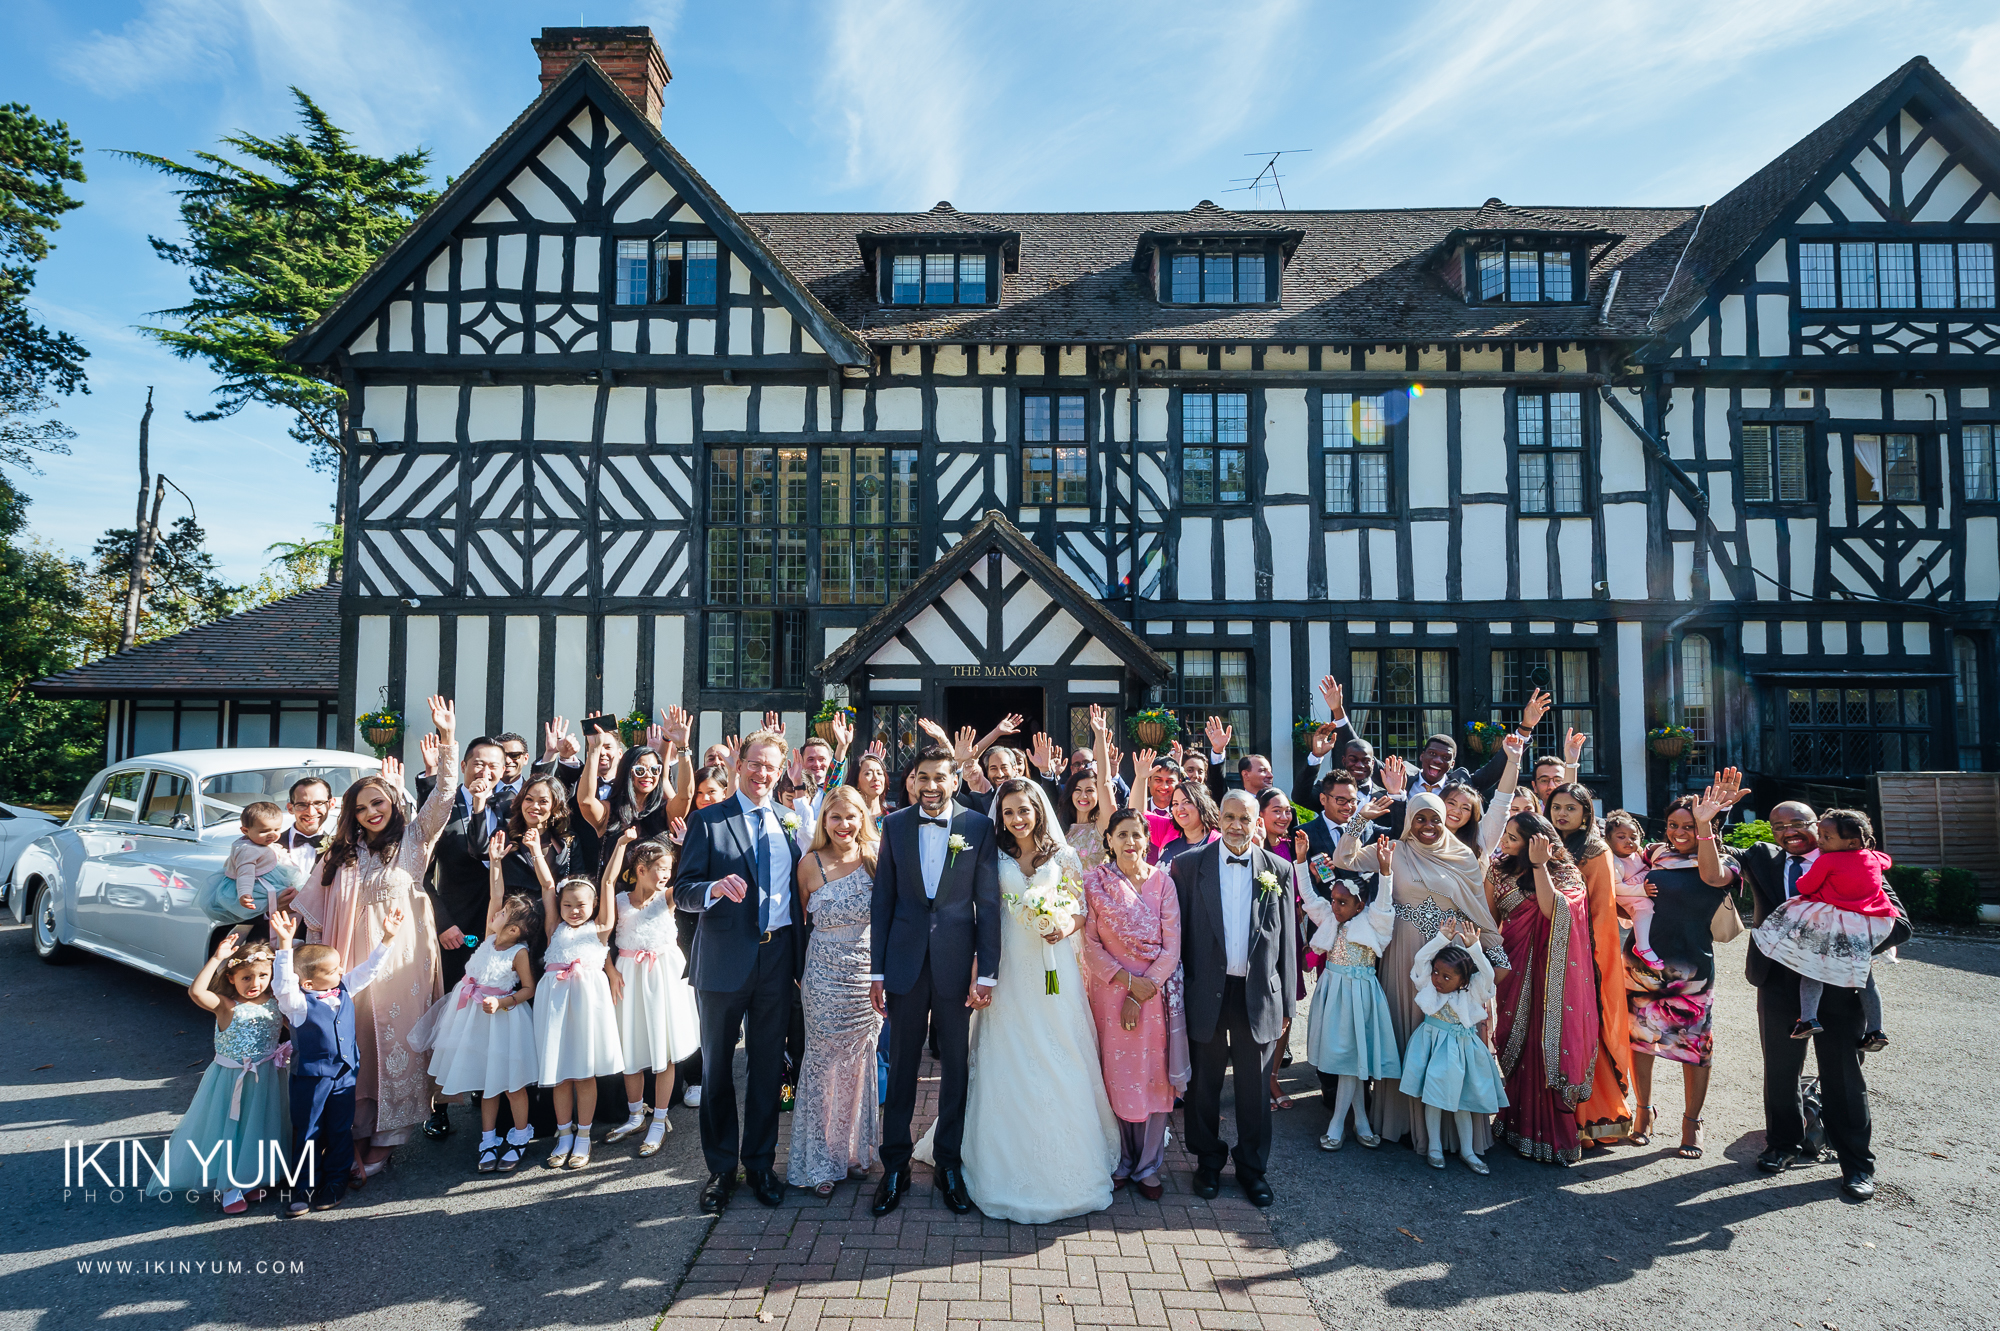 Laura Ashley Manor Wedding - Ikin Yum Photography-079.jpg